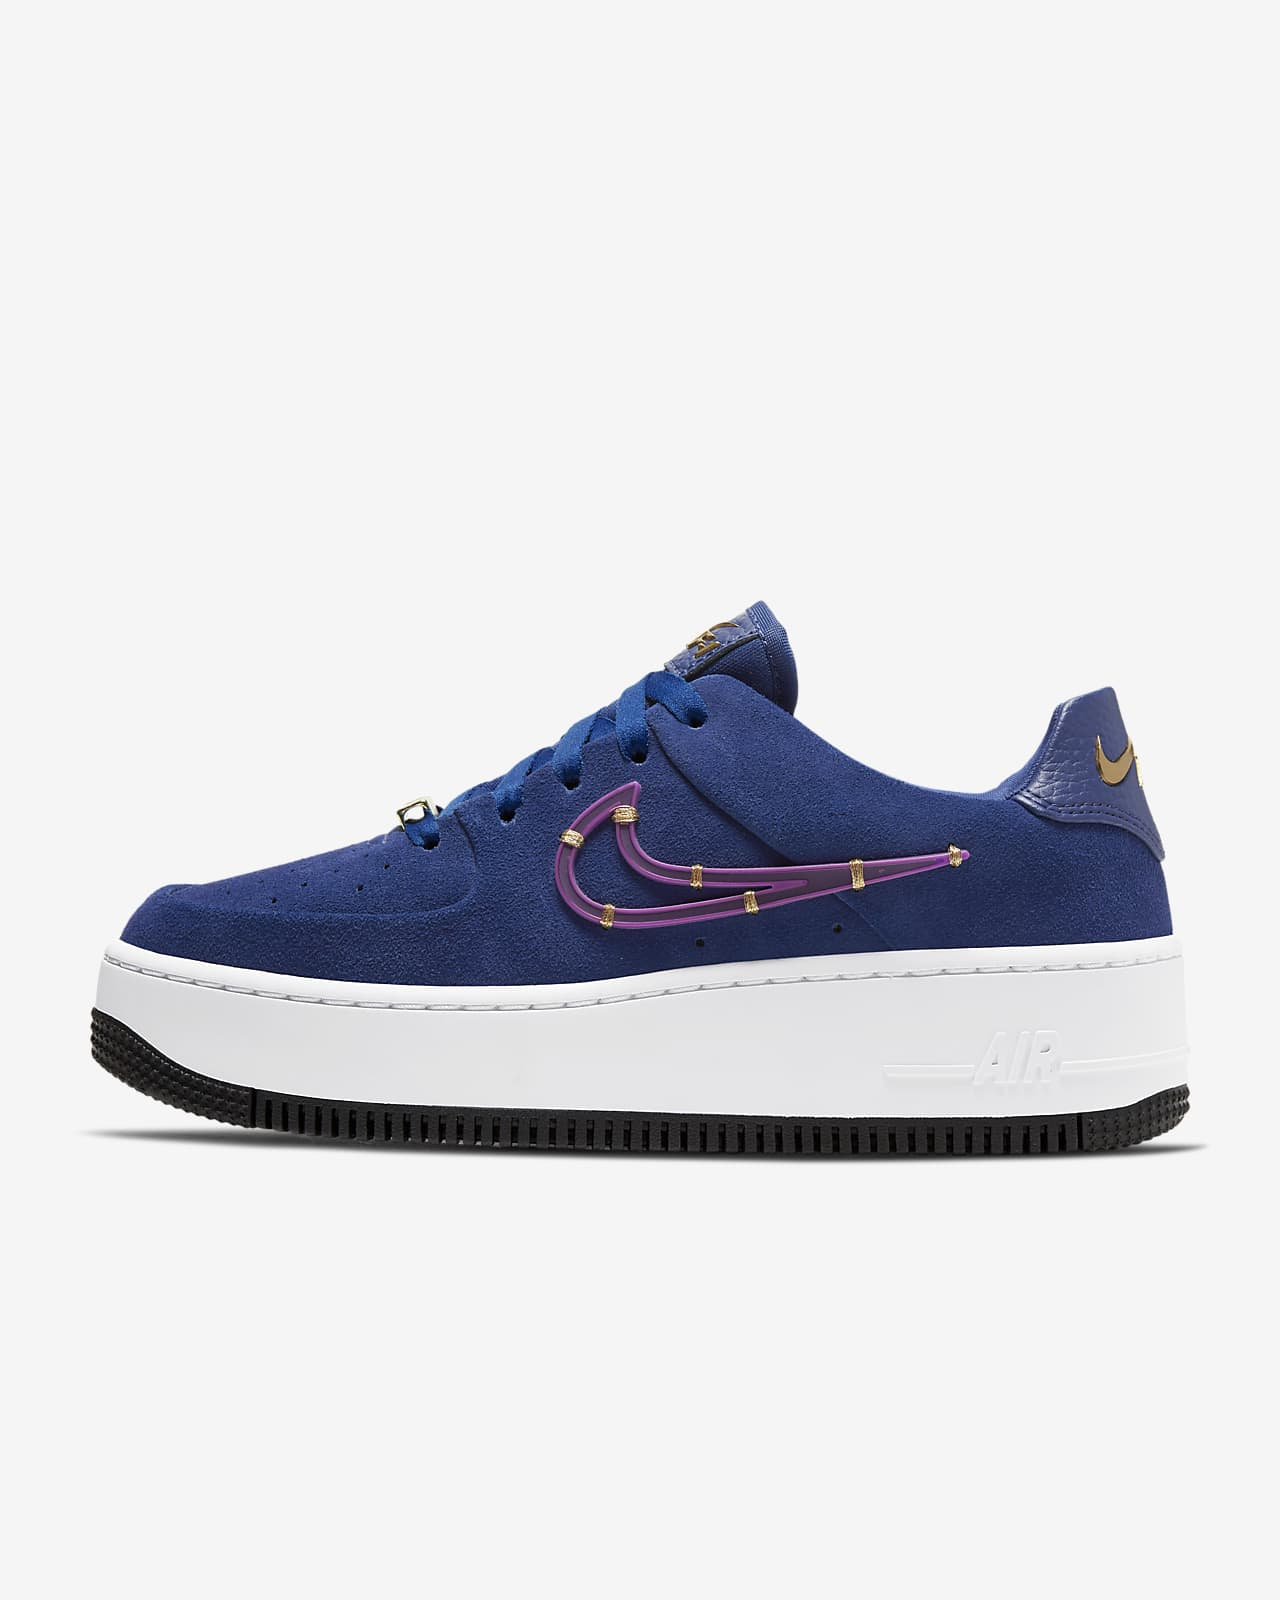 Calzado para mujer Nike Air Force 1 Sage Low LX